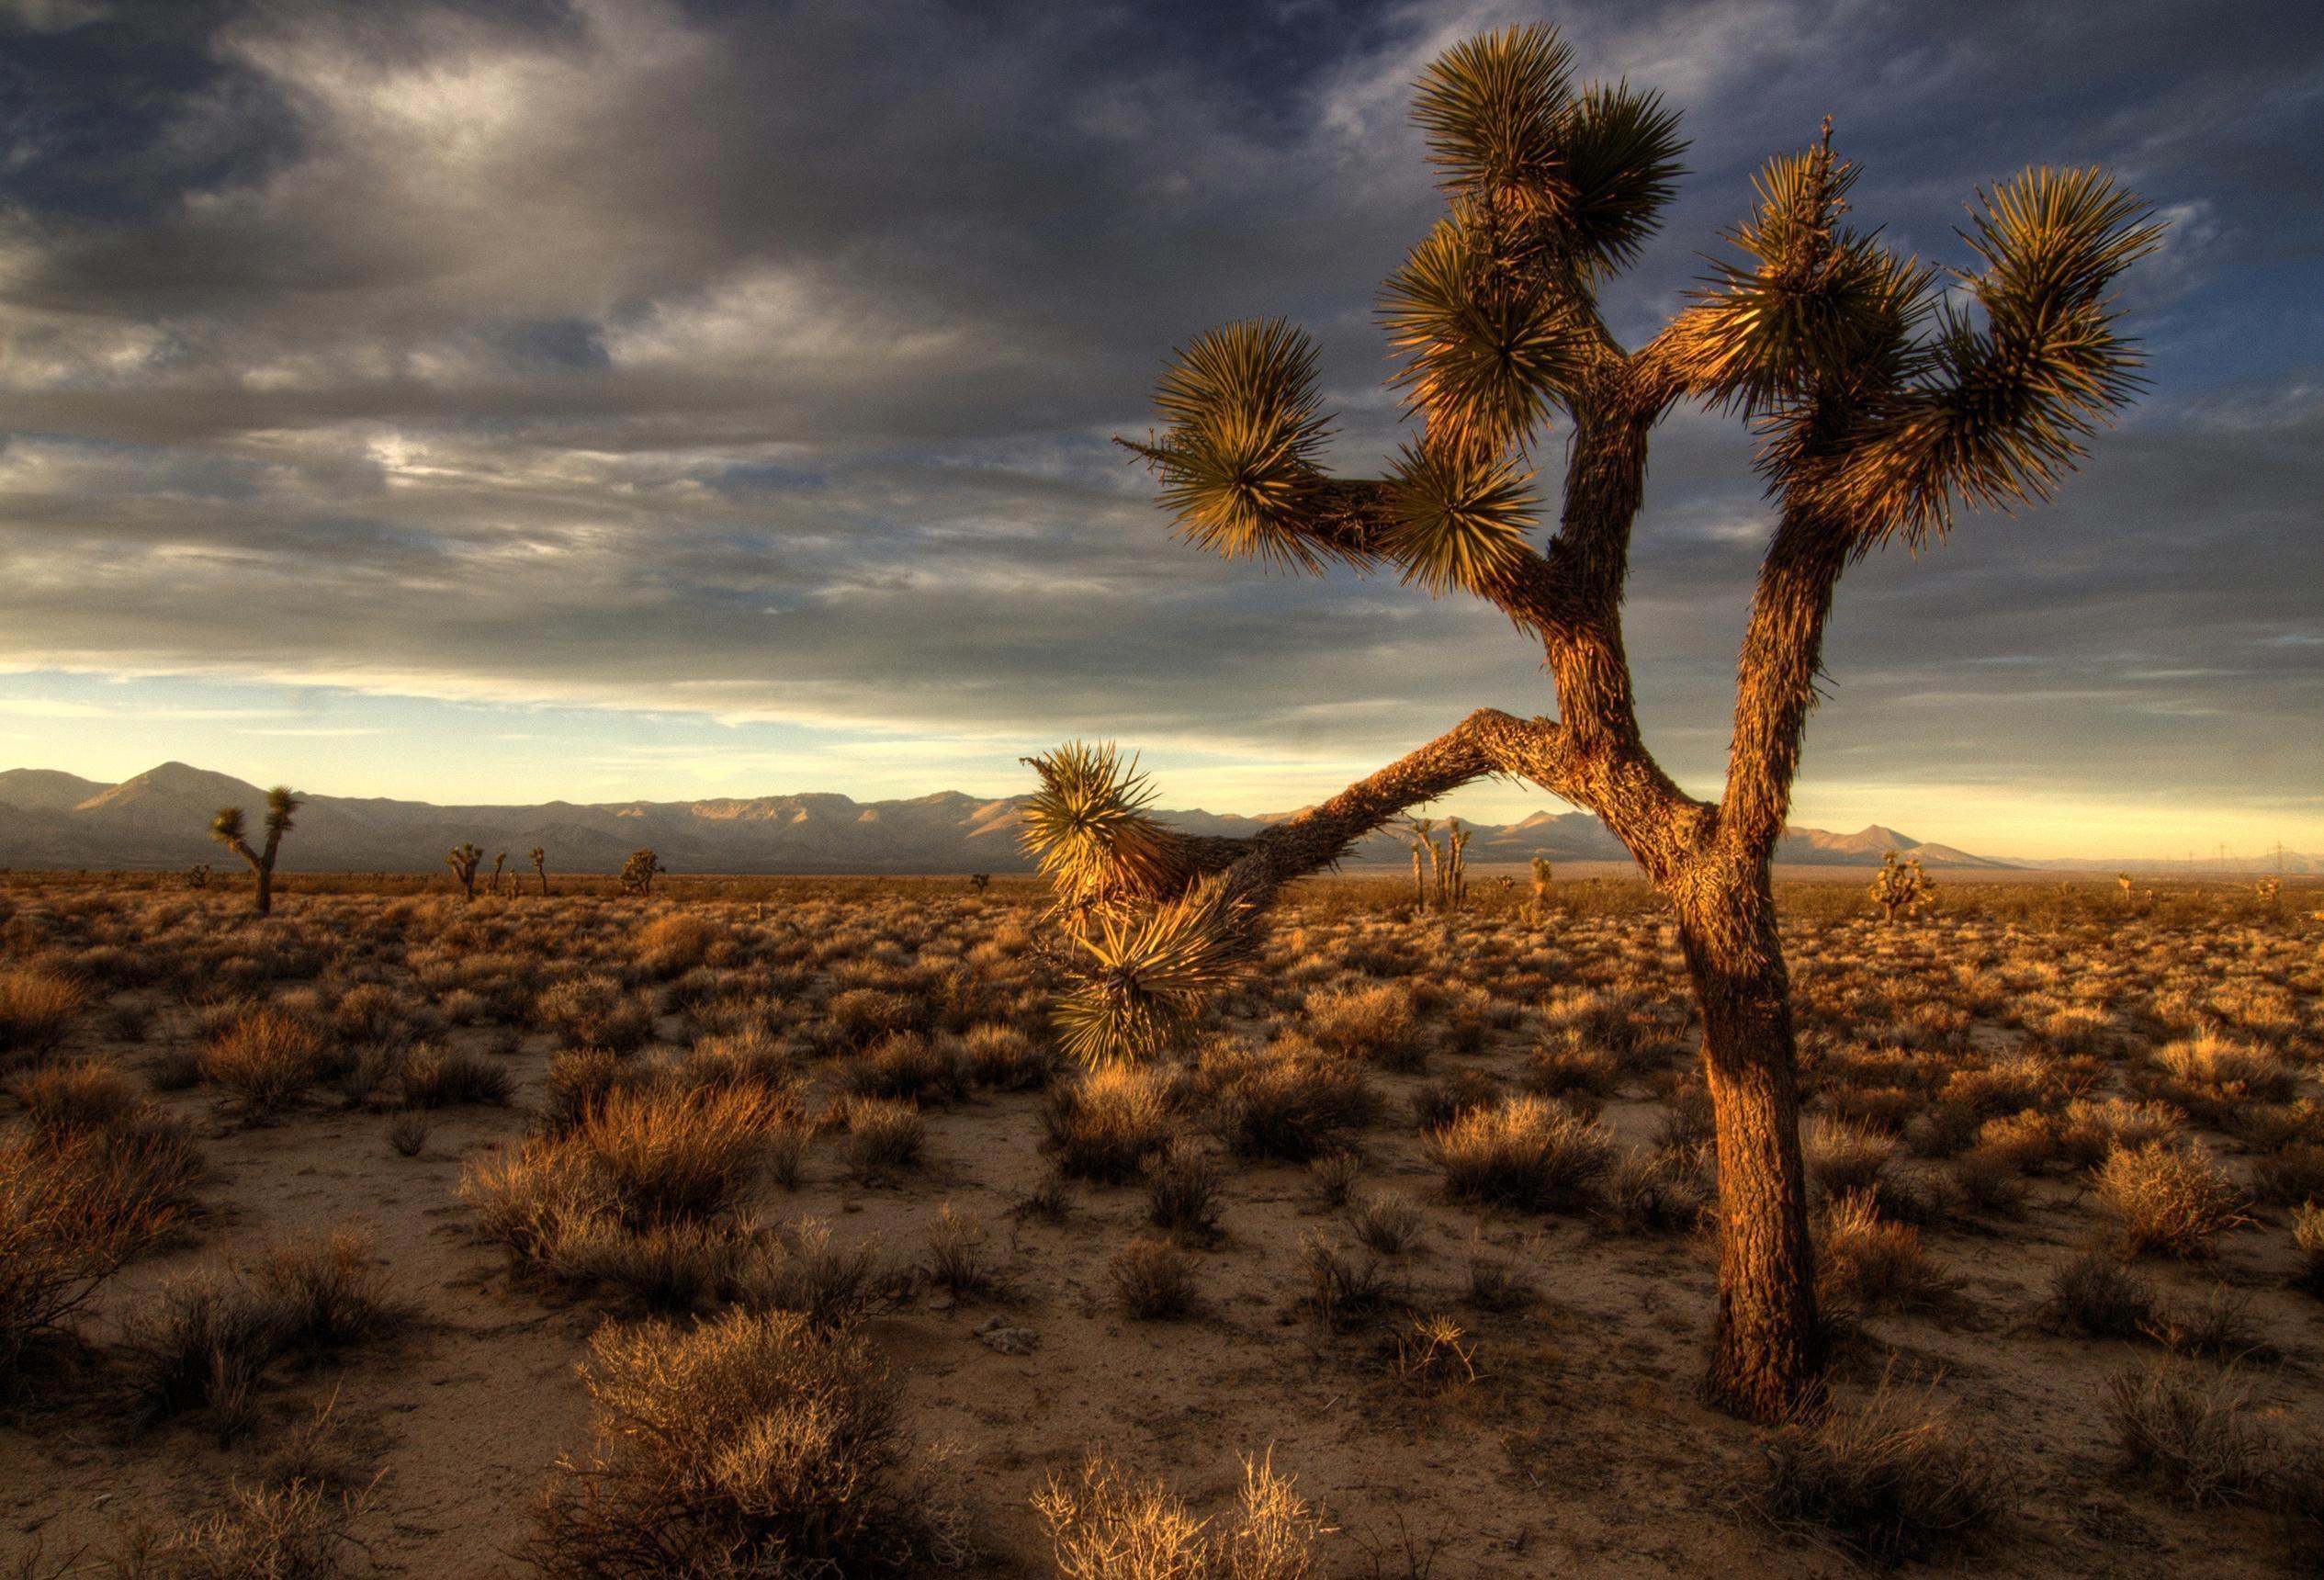 Joshua Tree At Sunset Mojave Desert California Oc 2530 1720 Reddit Photo Snapping Joshua Tree Wallpaper Scenery Pictures Mojave Desert Hd wallpaper sunset desert trees bushes